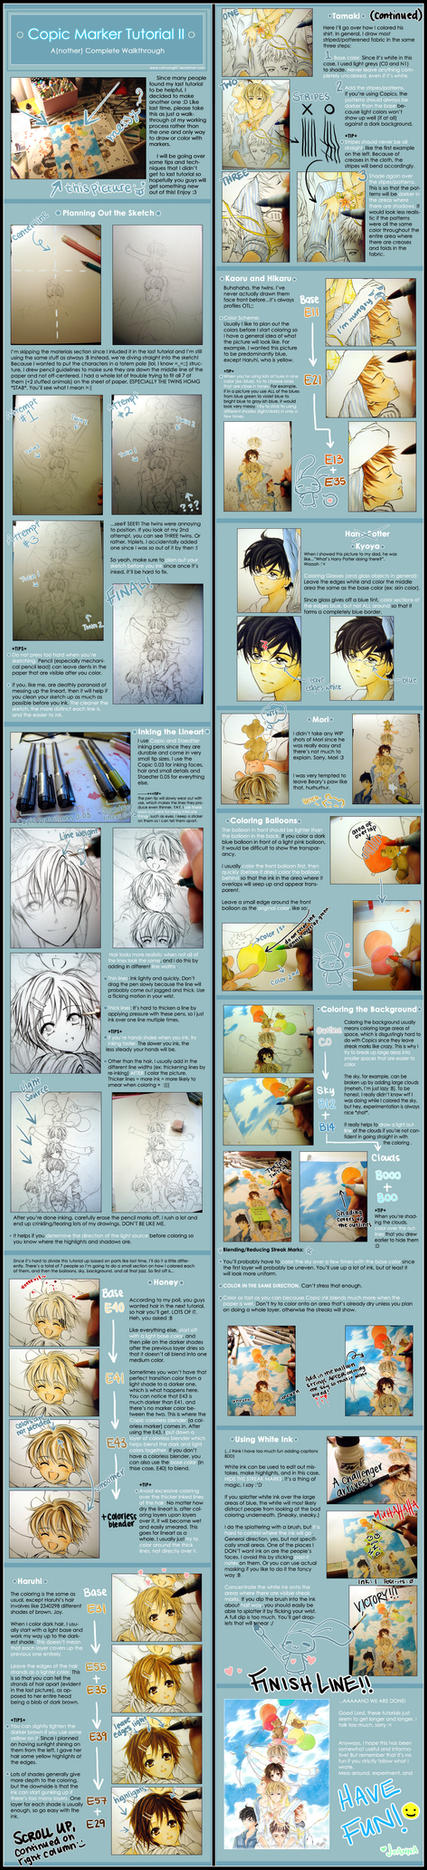 Copic Marker Tutorial II by cartoongirl7